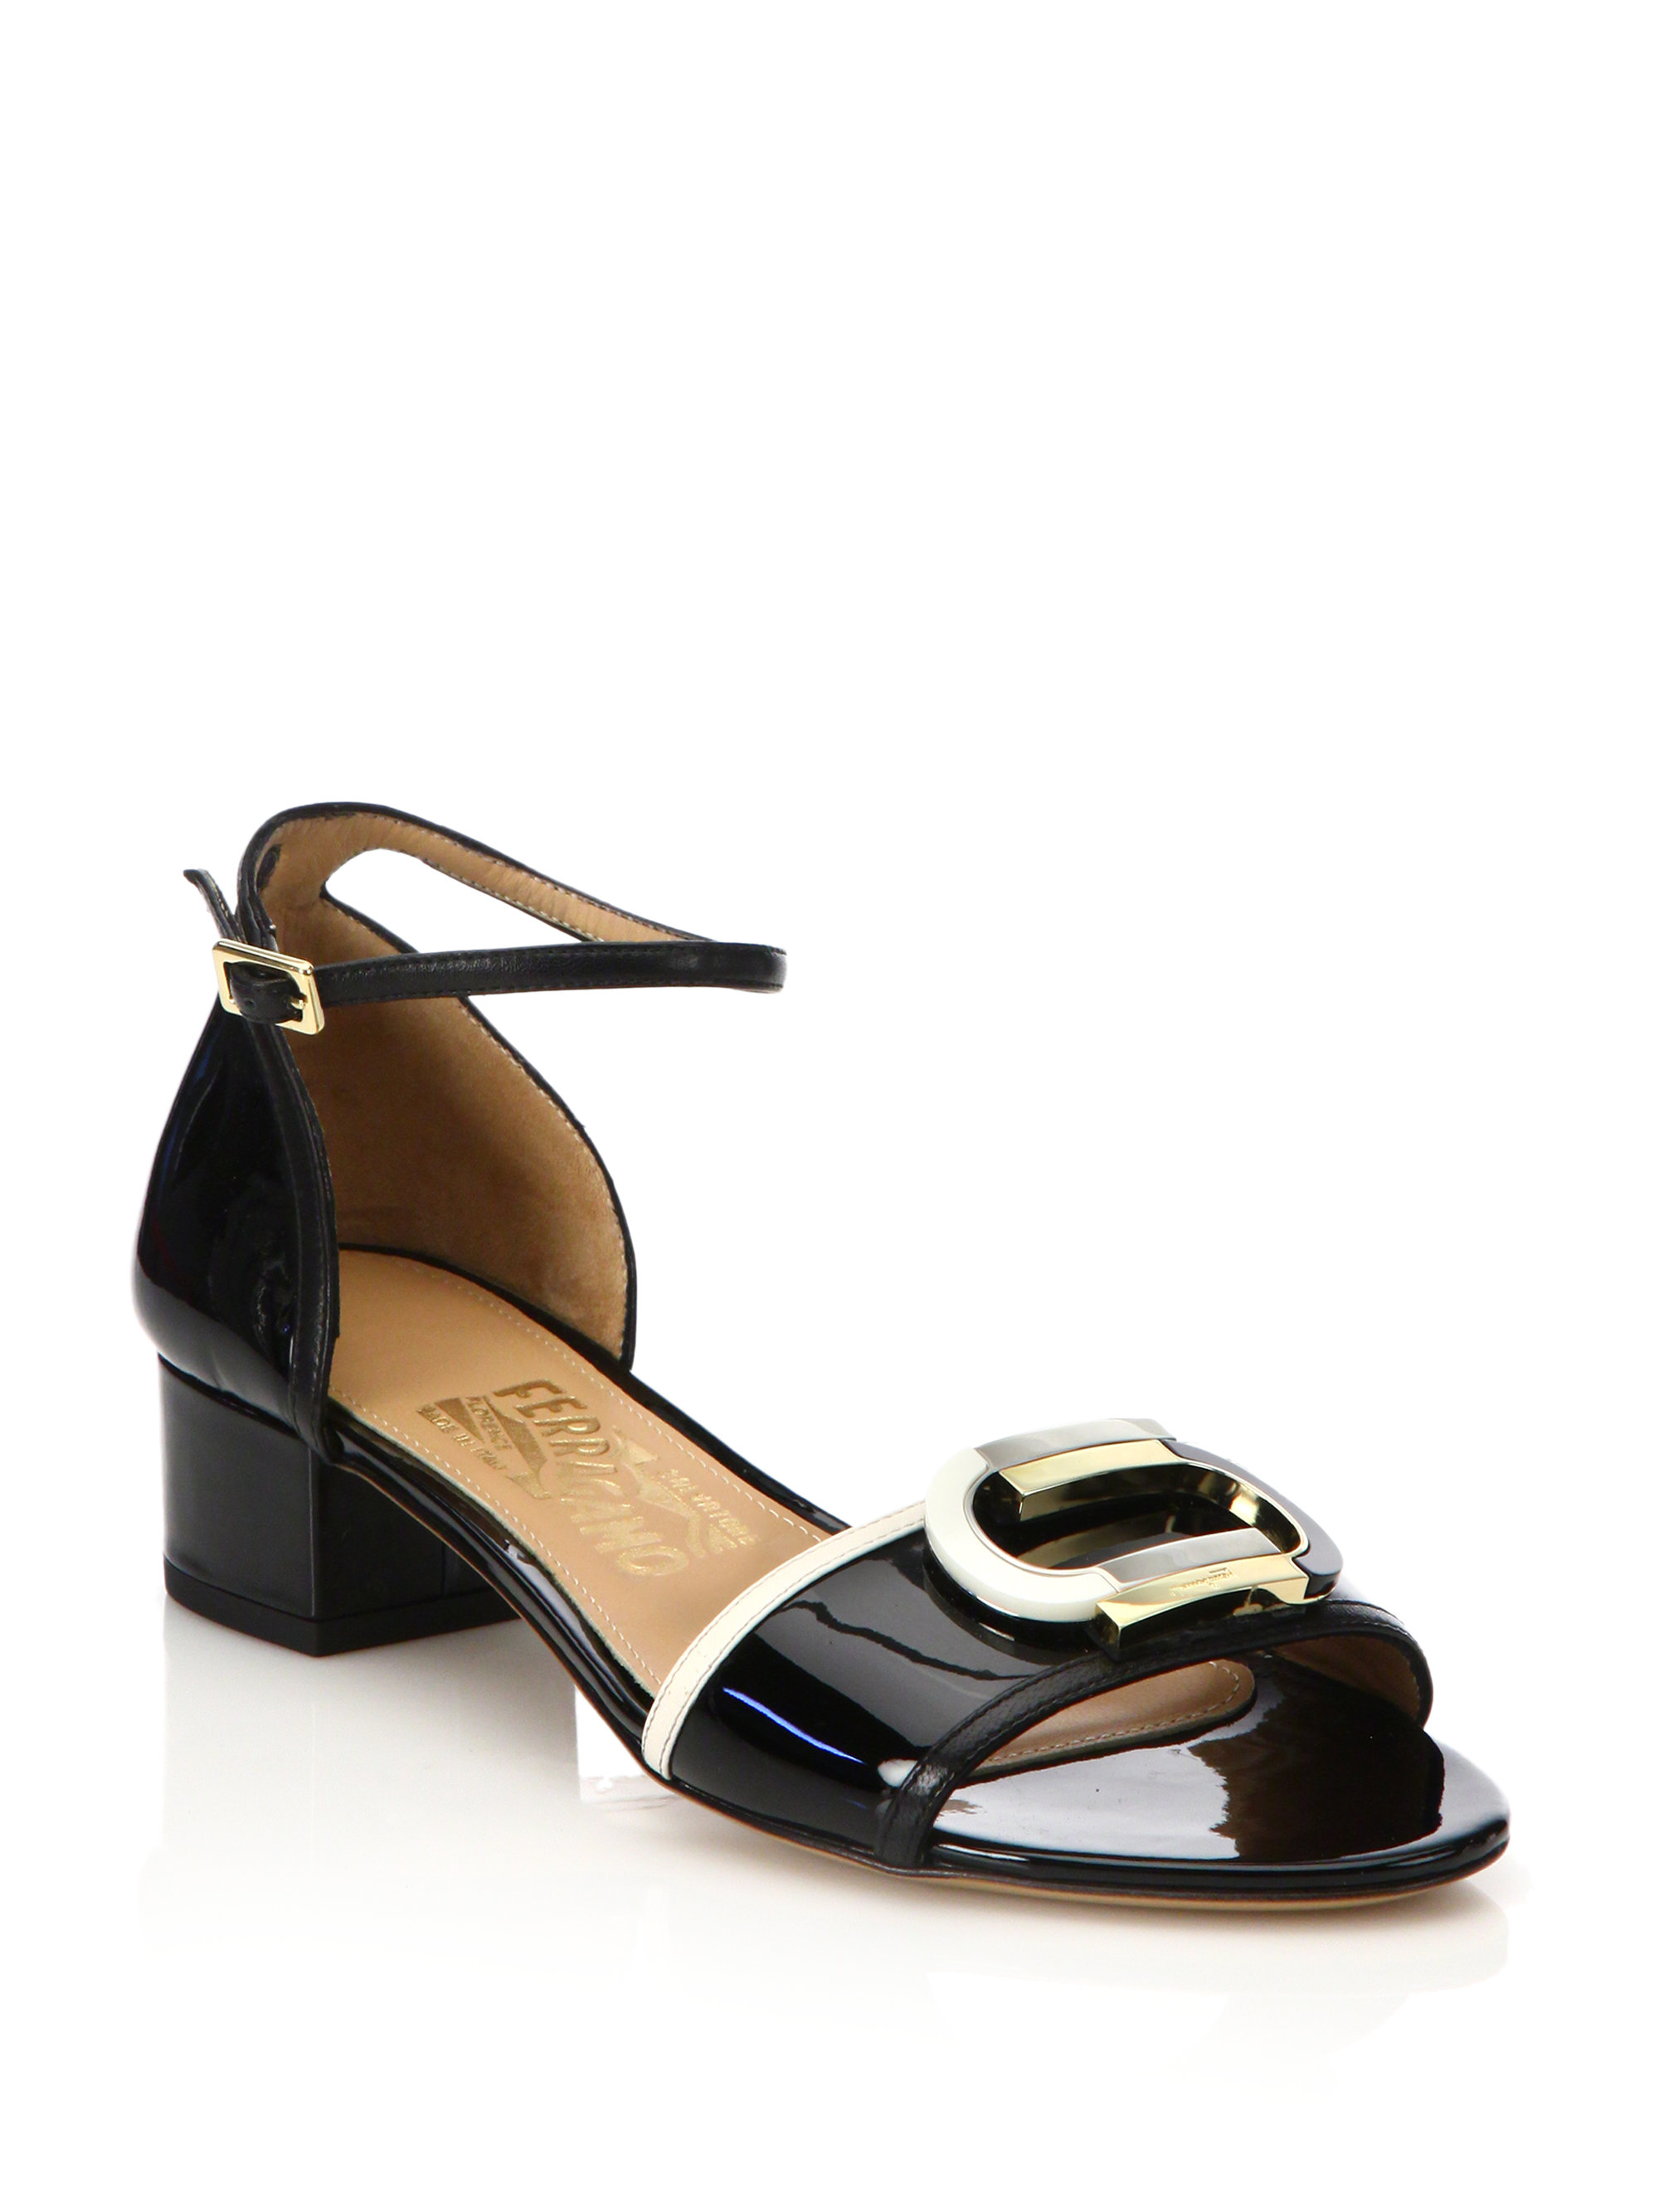 Lyst Ferragamo Glenn Colorblock Patent Leather Mid Heel